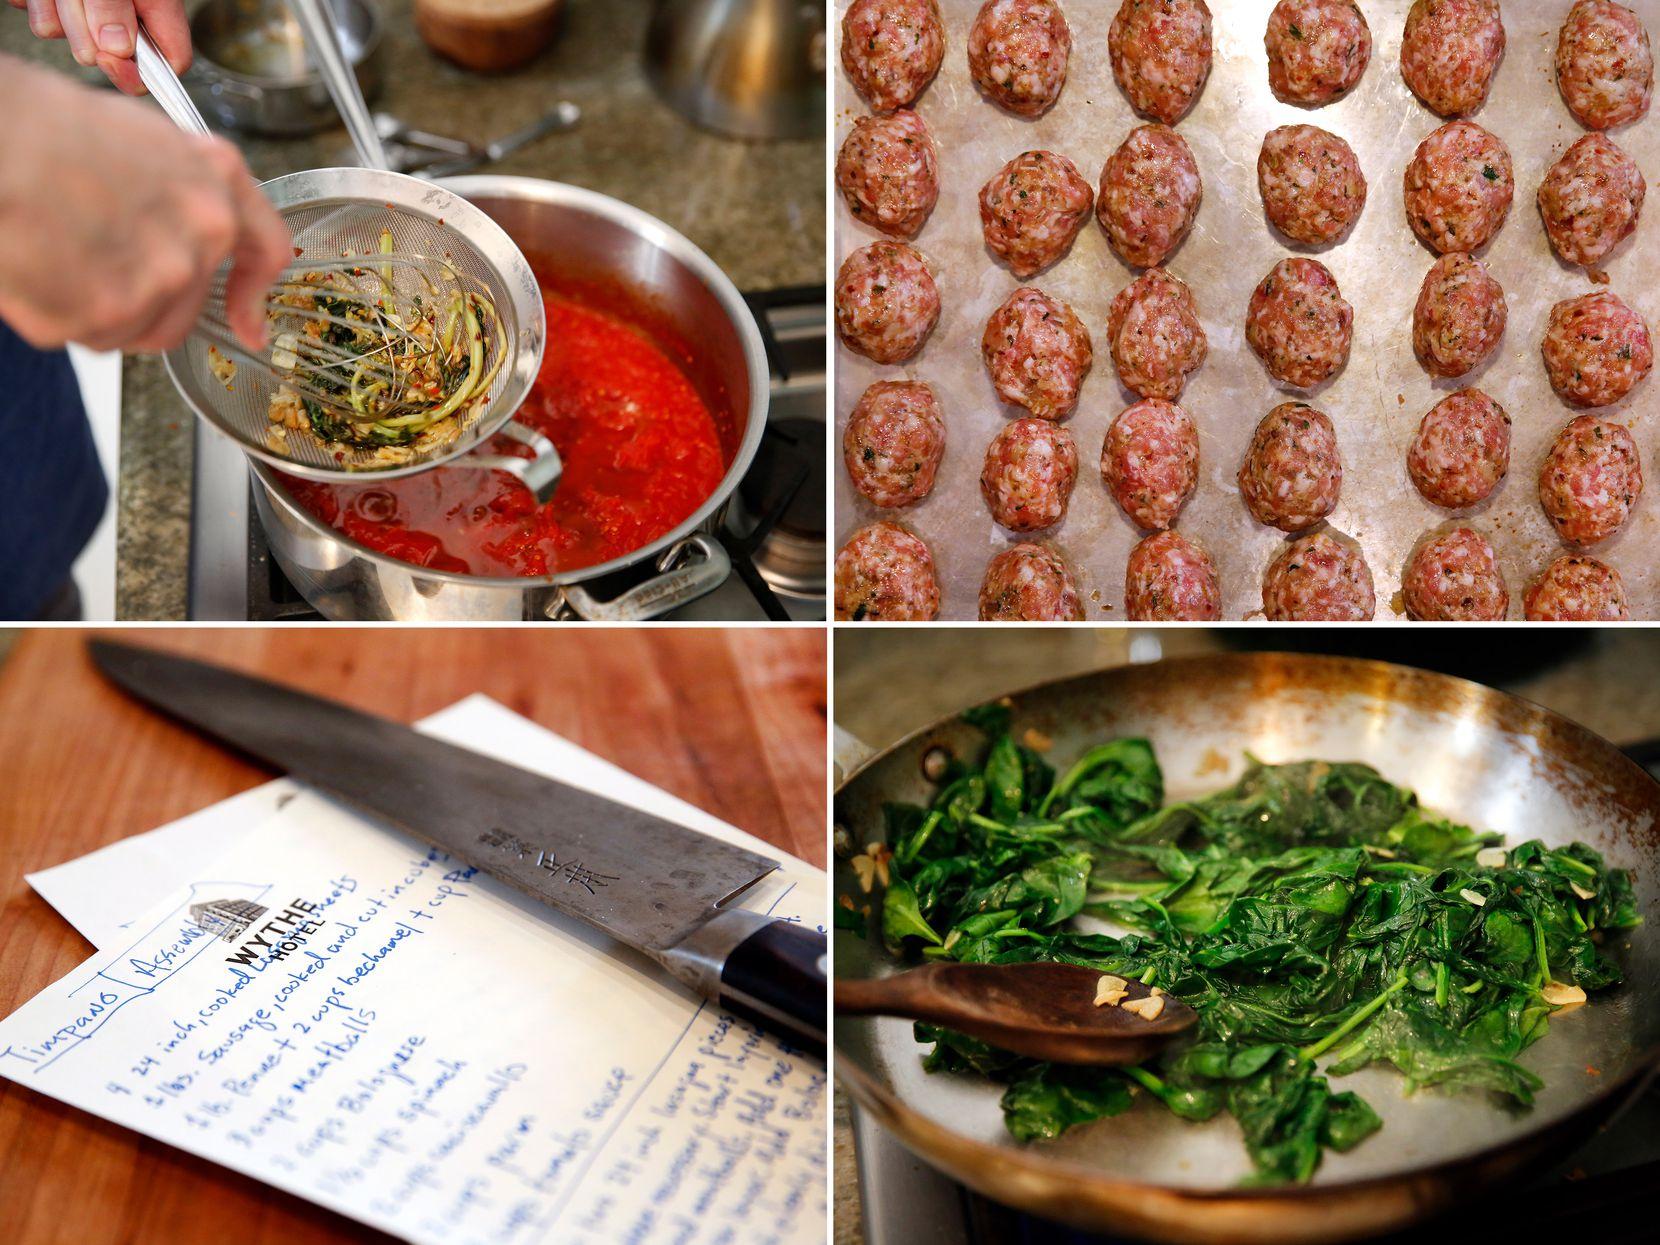 Clockwise from top left: Julian Barsotti strains bail-garlic oil into tomato sauce; chicken-pork belly meatballs; sauteing spinach; Barsotti's handwritten recipe (Tom Fox/Staff Photographer)